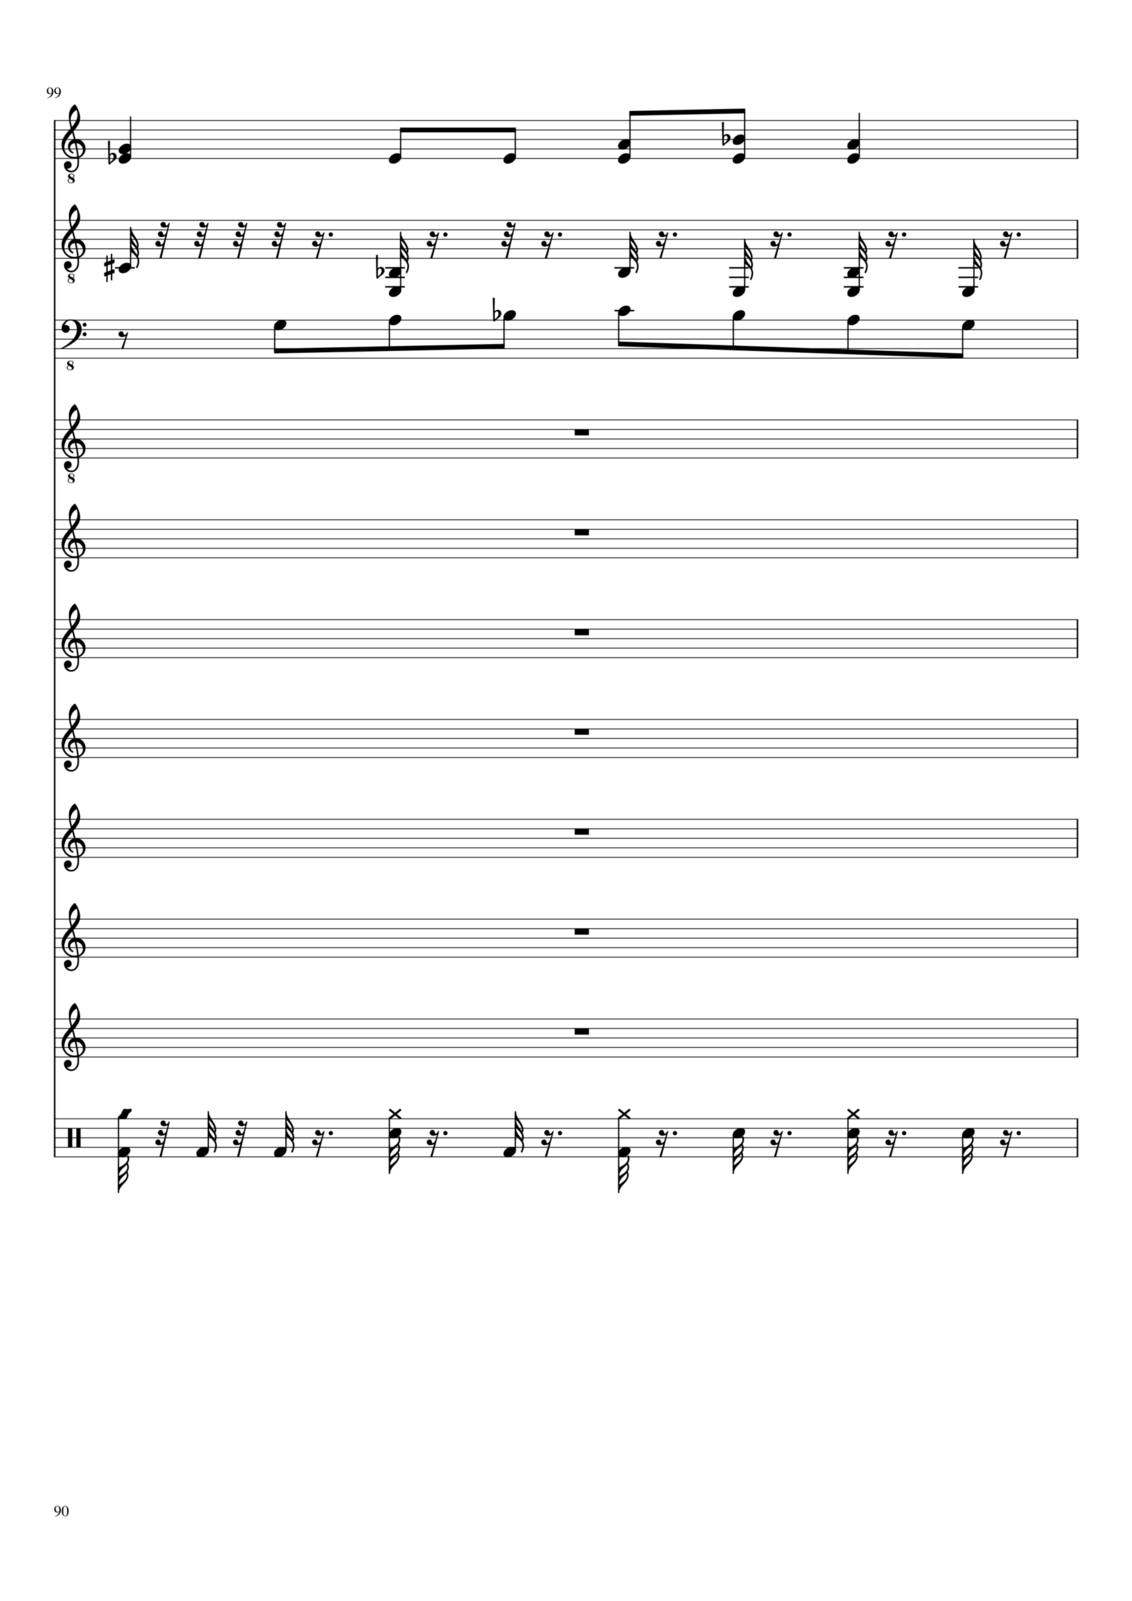 Belyiy sokol slide, Image 90